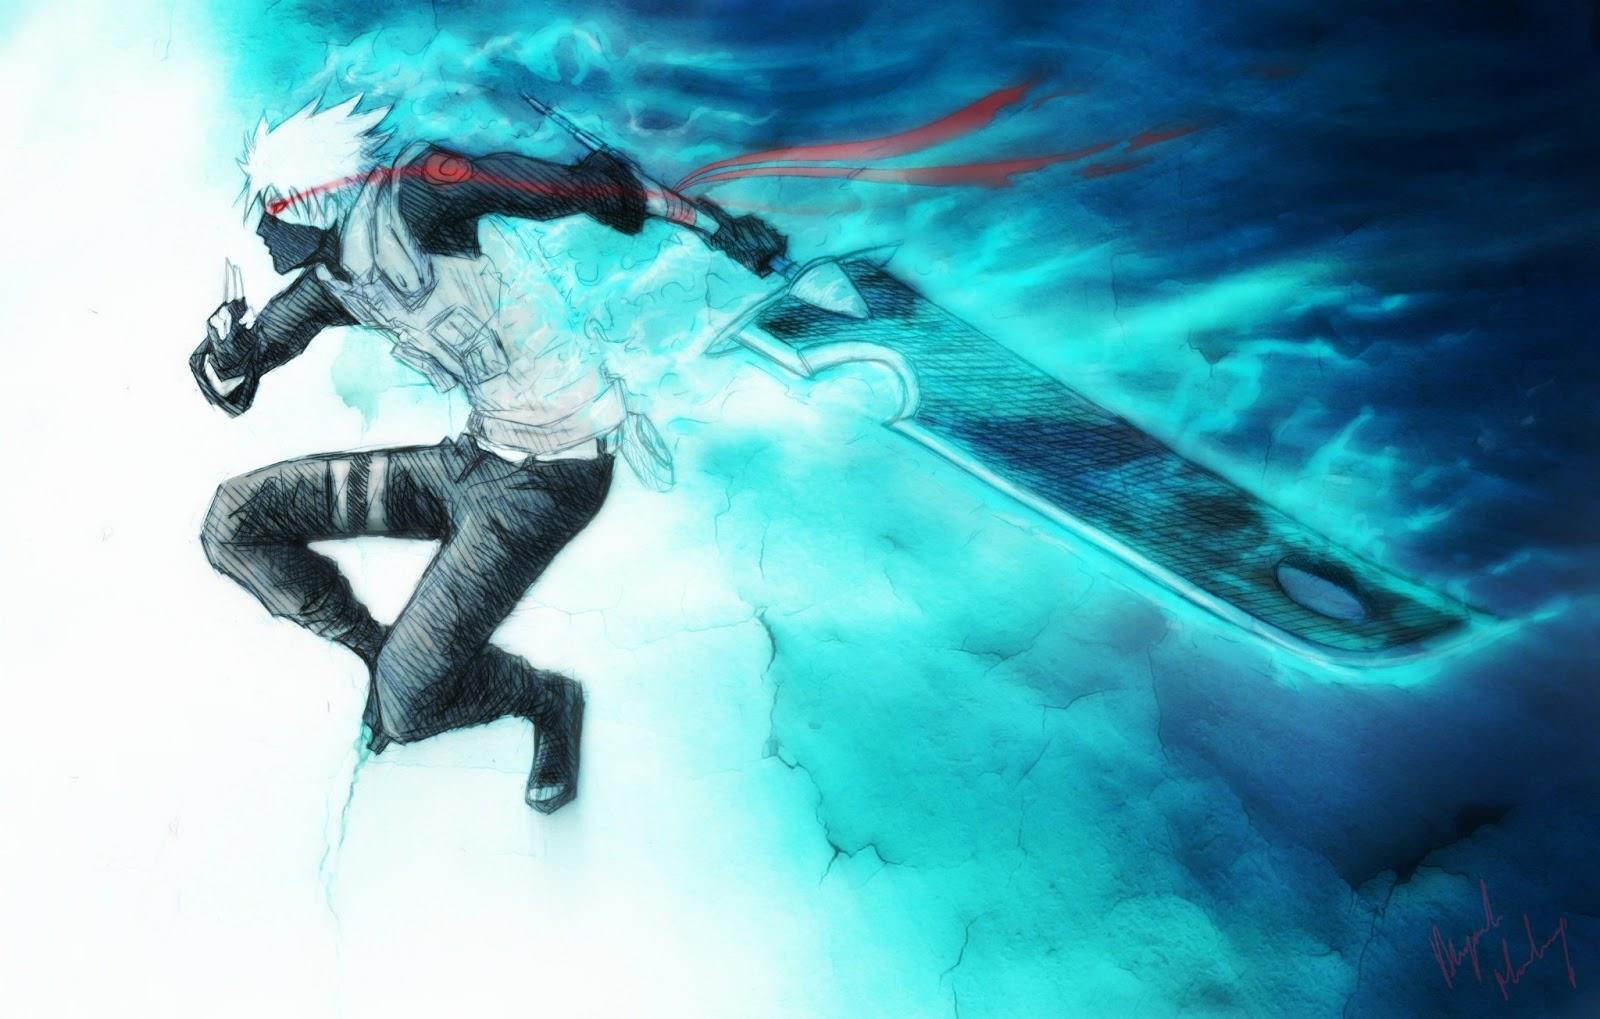 Naruto Shippuden Kakashi Lightning Blade widescreen wallpaper (1600 x 1019 )